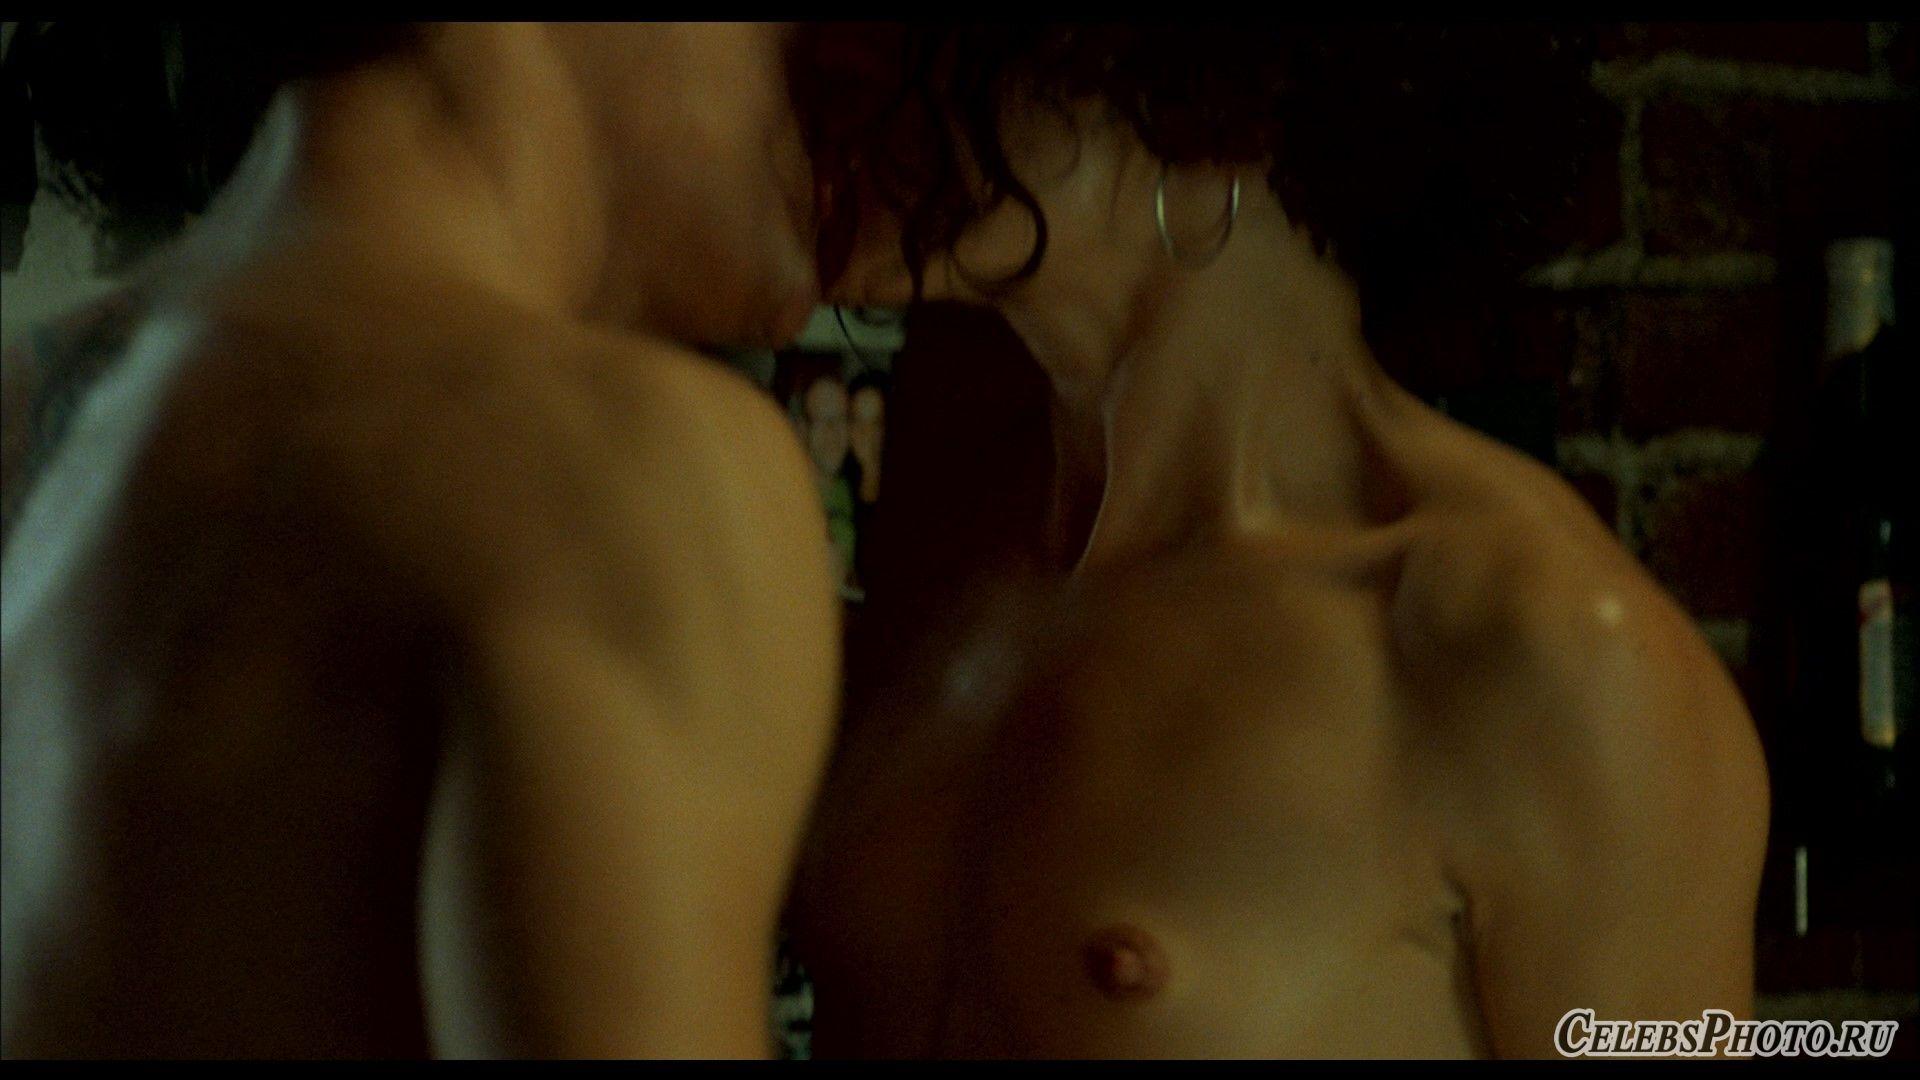 Секс, вечеринки и ложь – Мариета Ороско